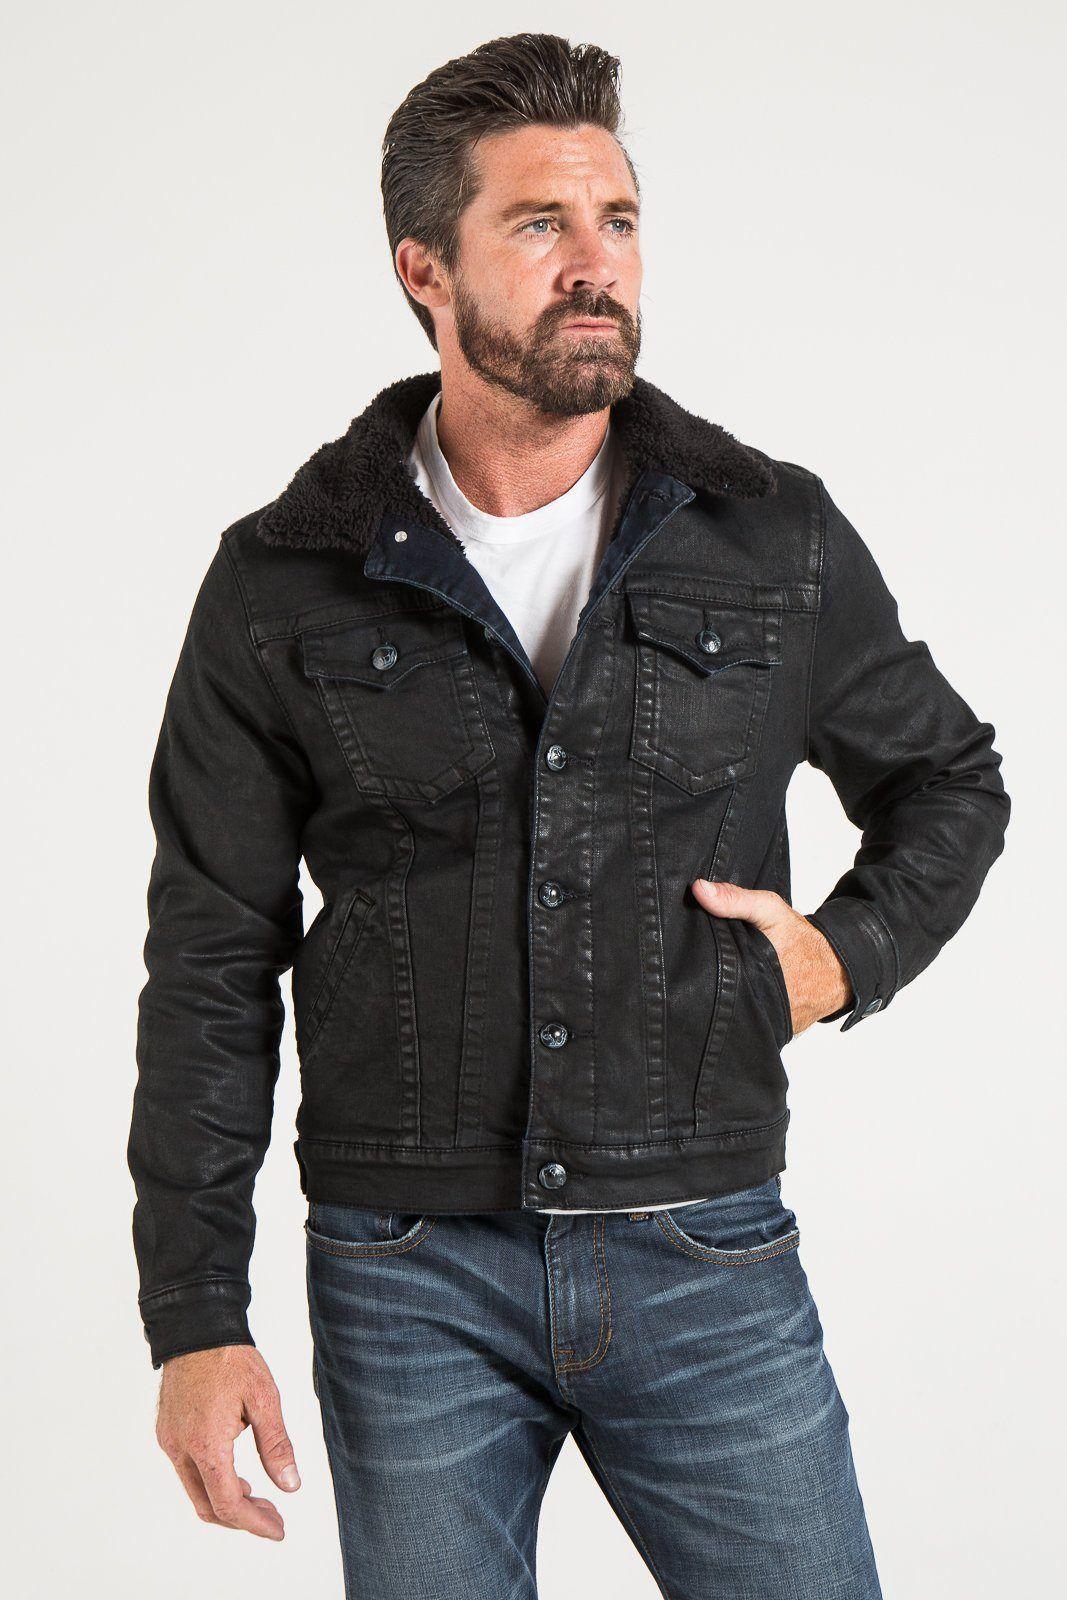 Classic sherpa denim jacket Sherpa denim jacket, Mens